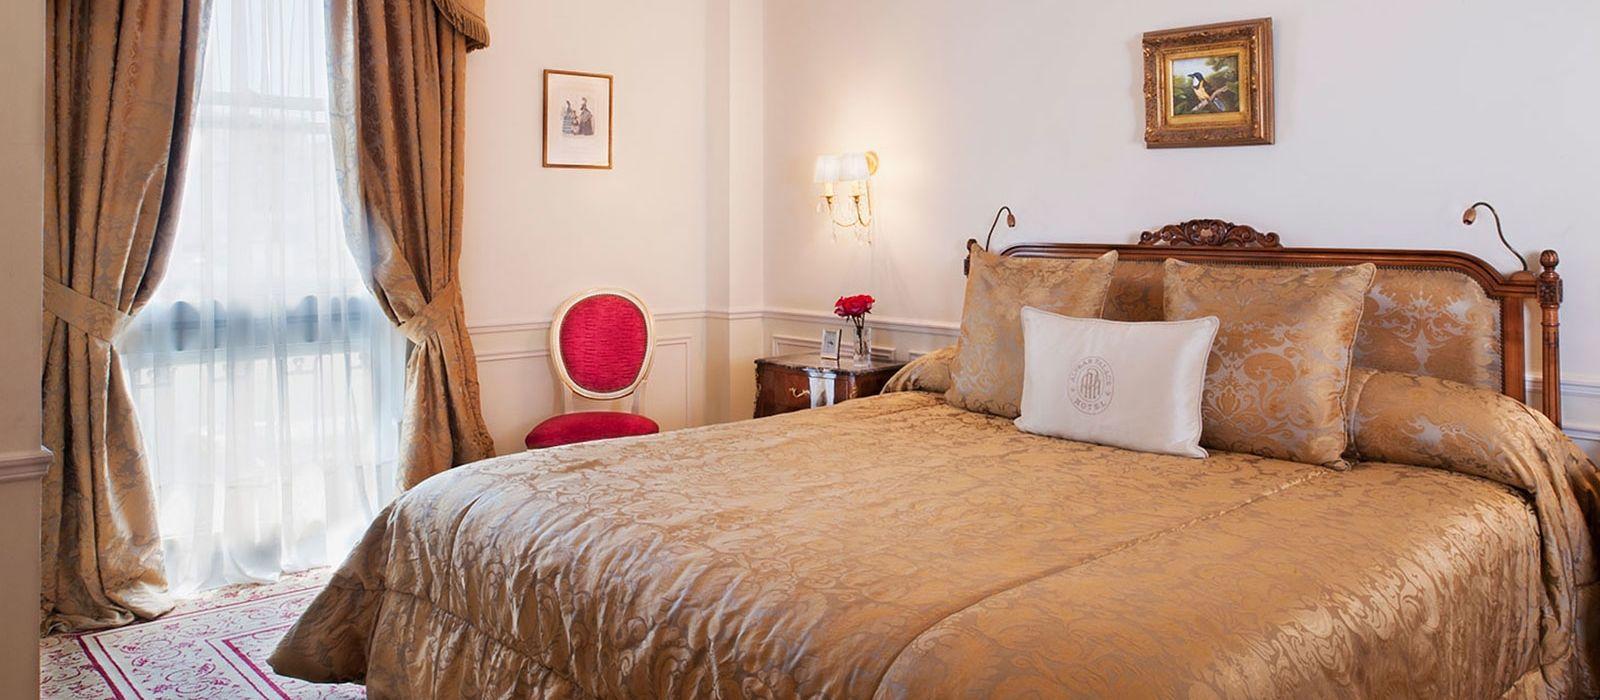 Hotel Alvear Palace Argentinien